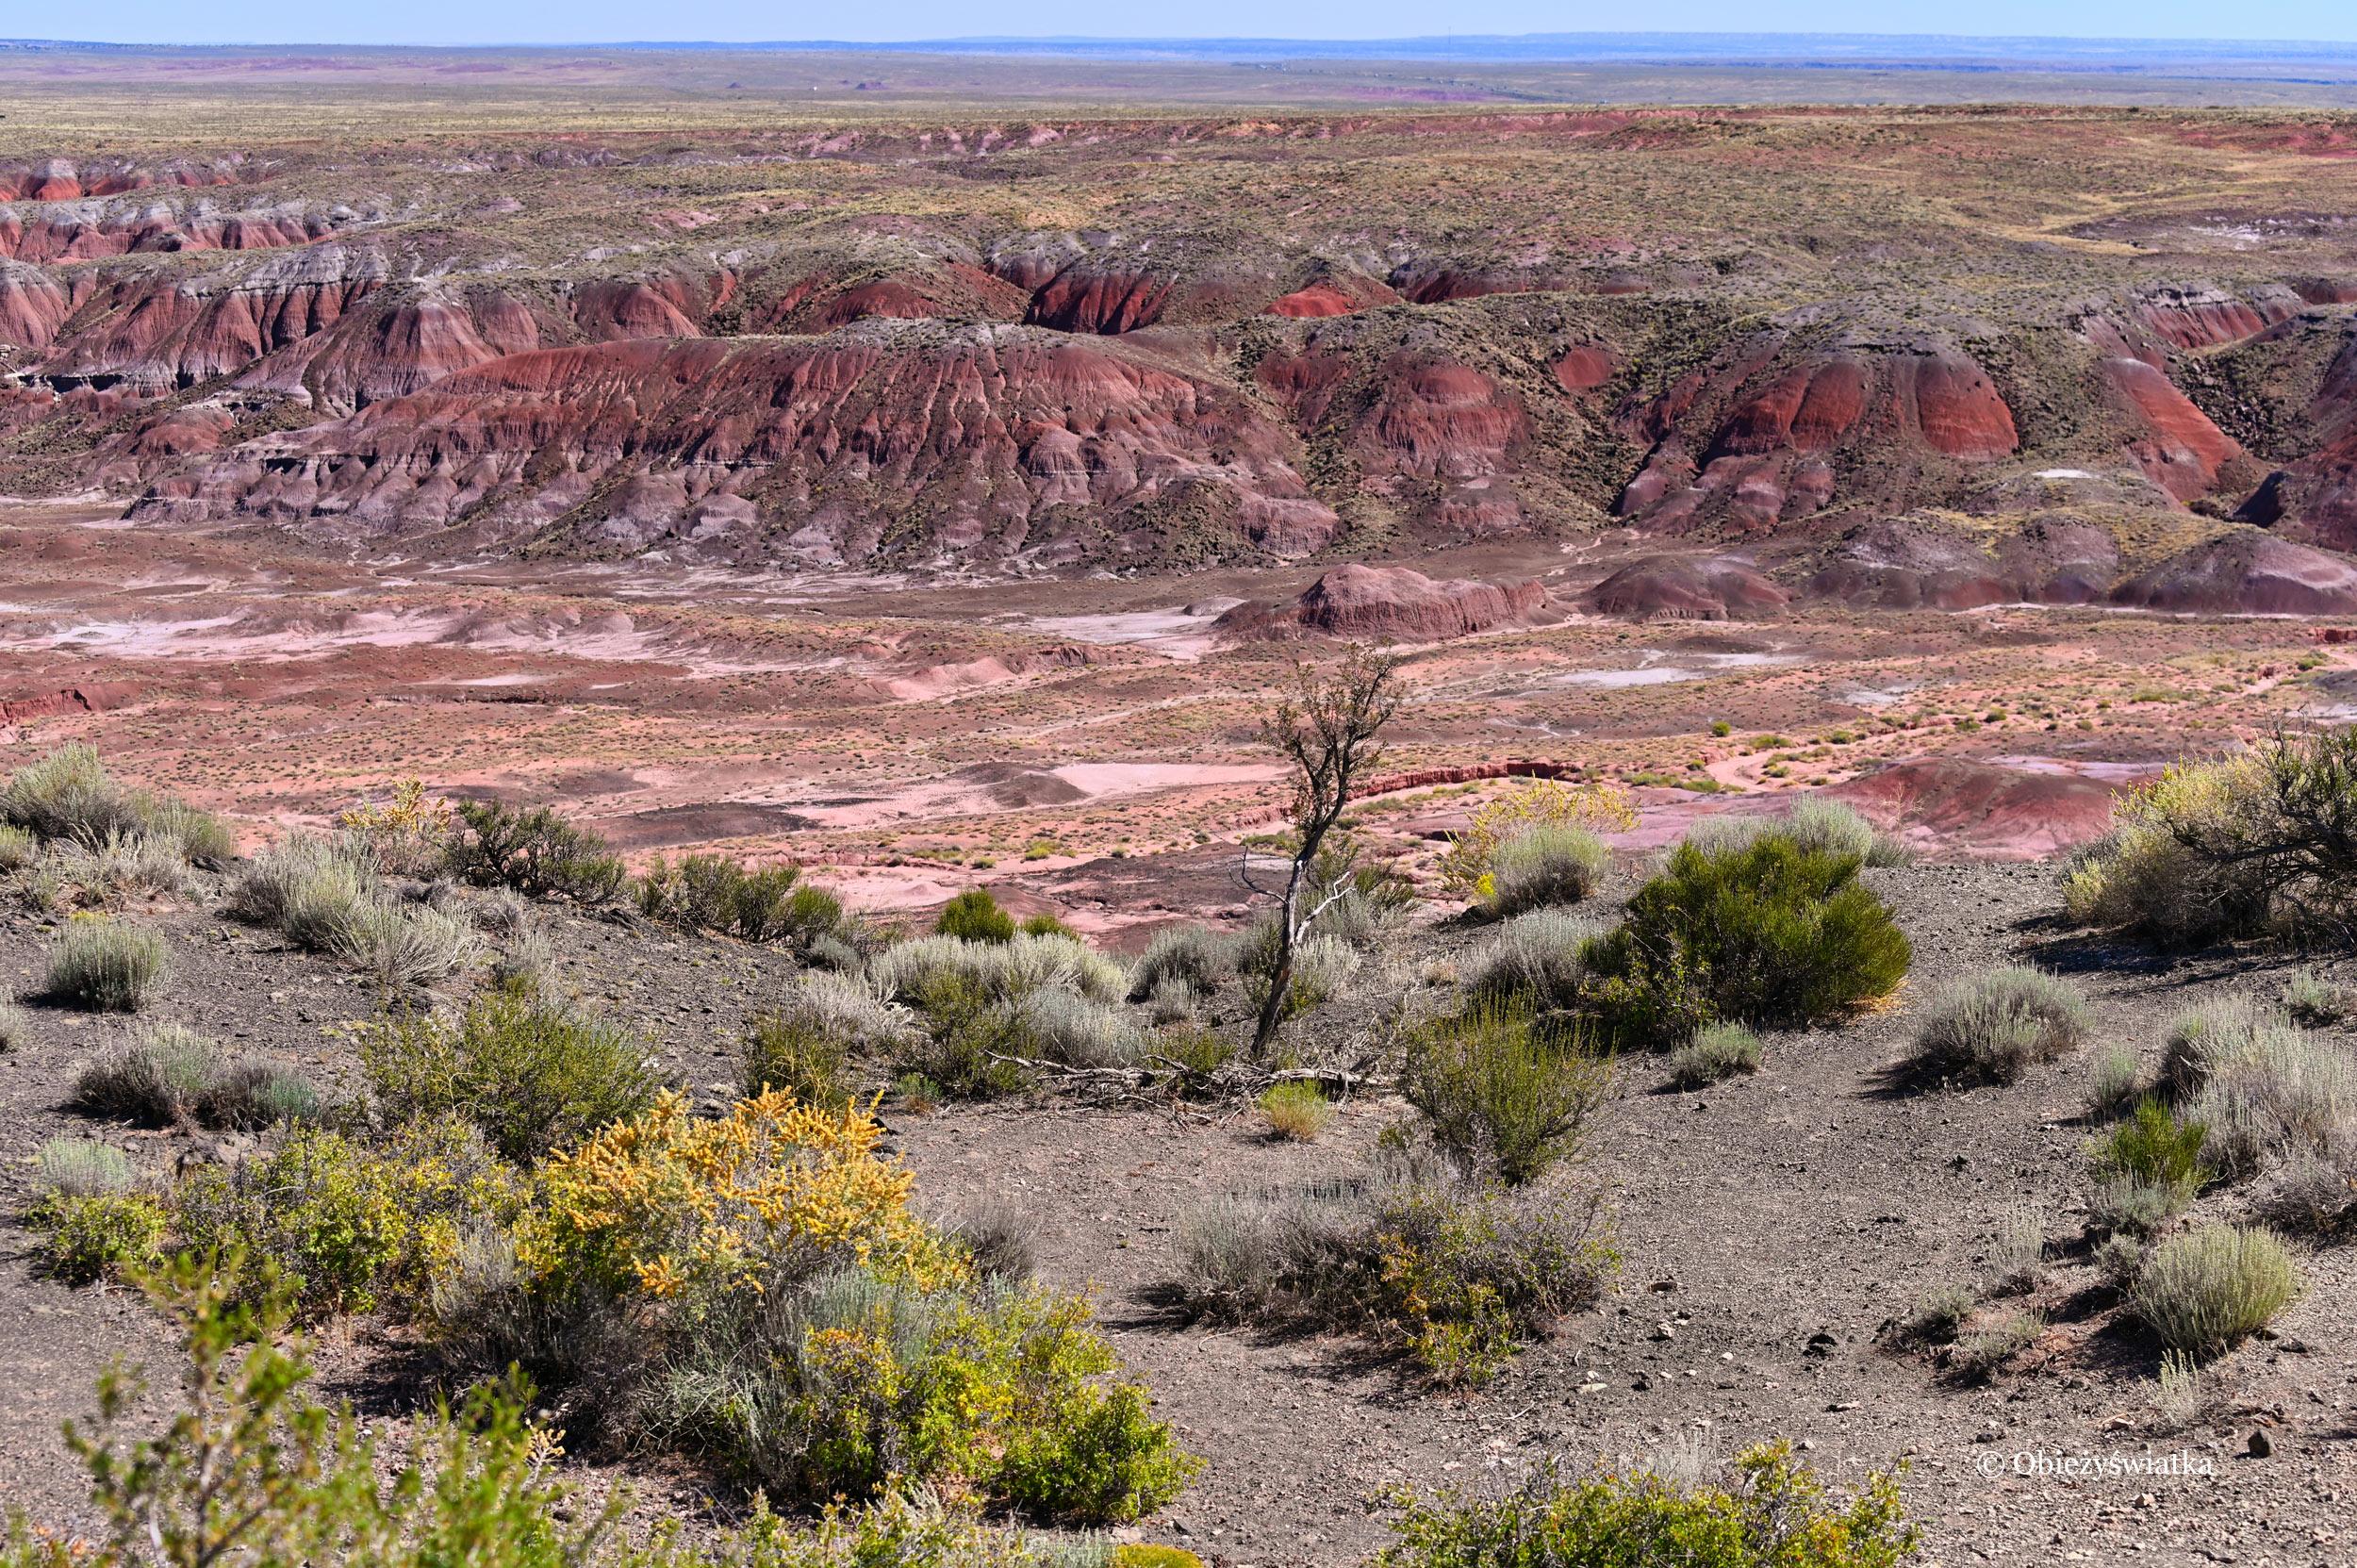 Pustynny krajobraz - Painted Desert, Arizona